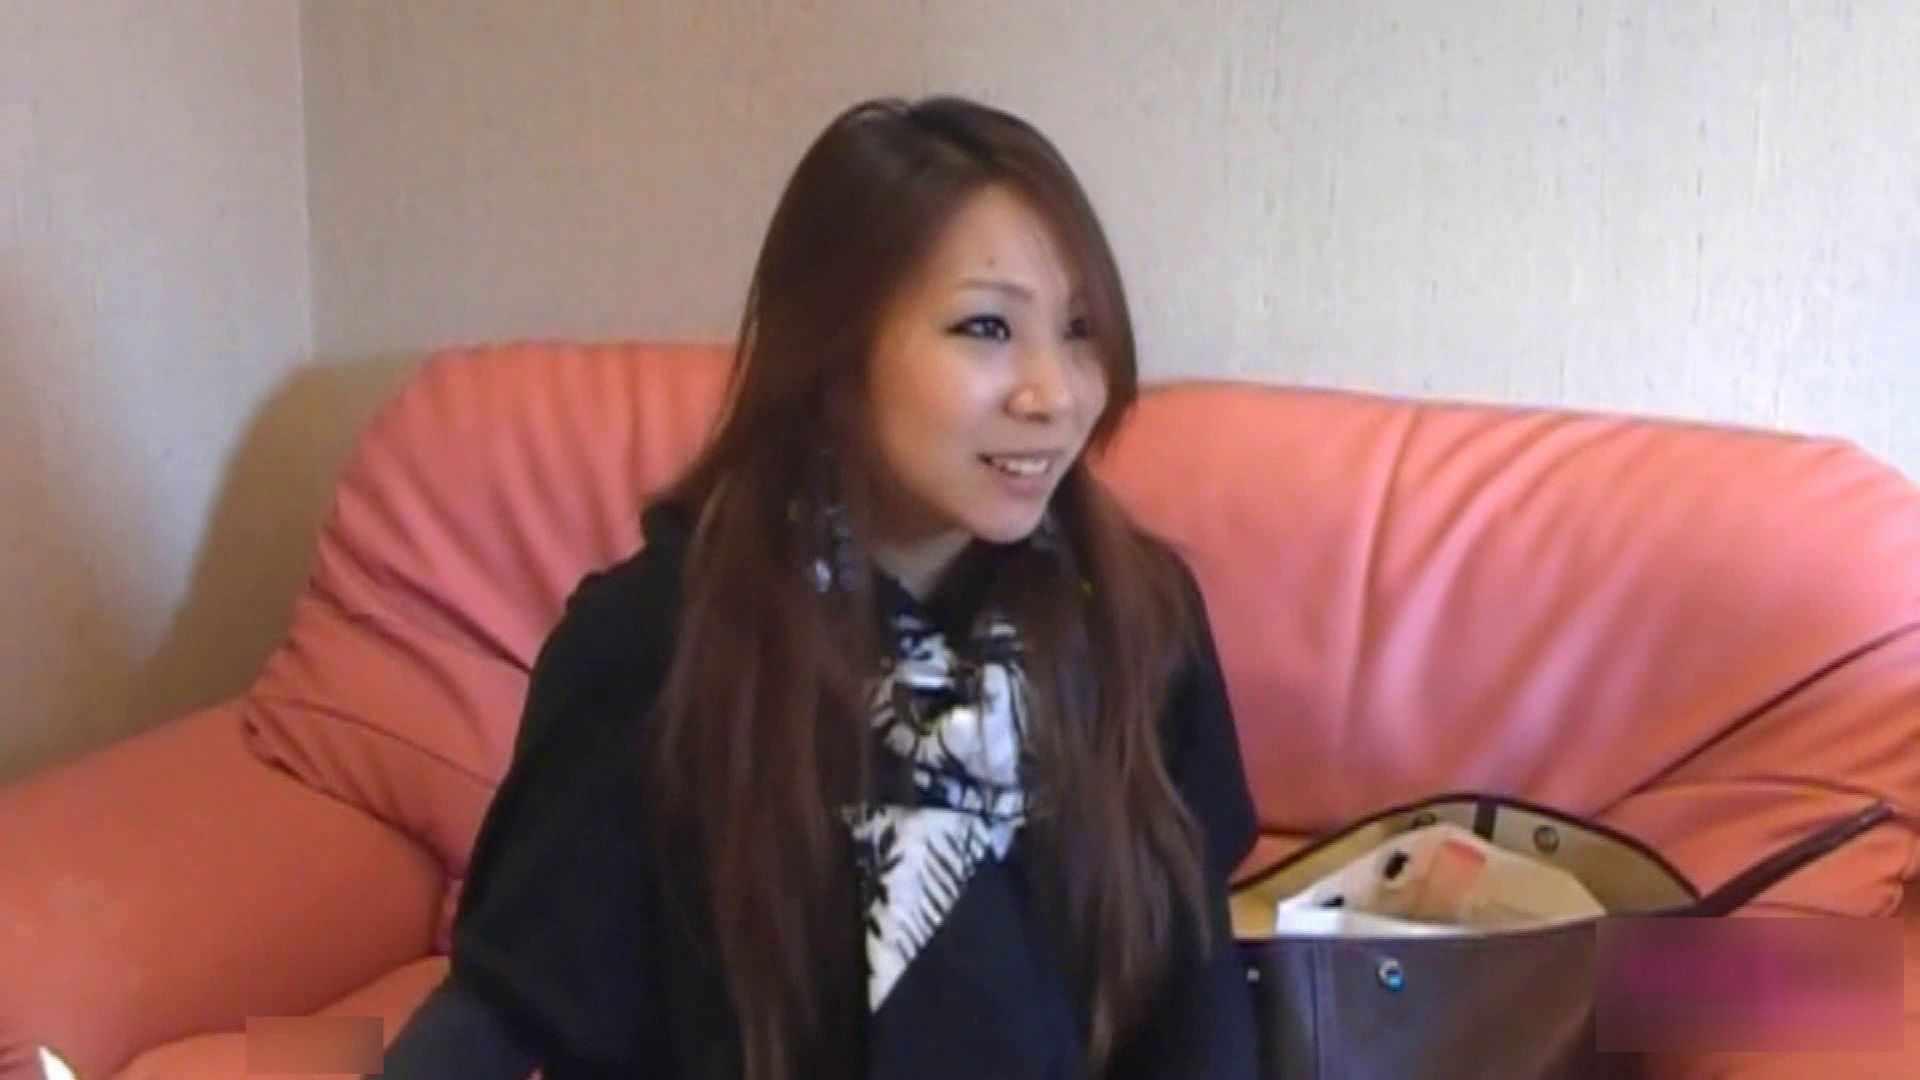 S級厳選美女ビッチガールVol.06 OLセックス | 美女ヌード  109画像 3